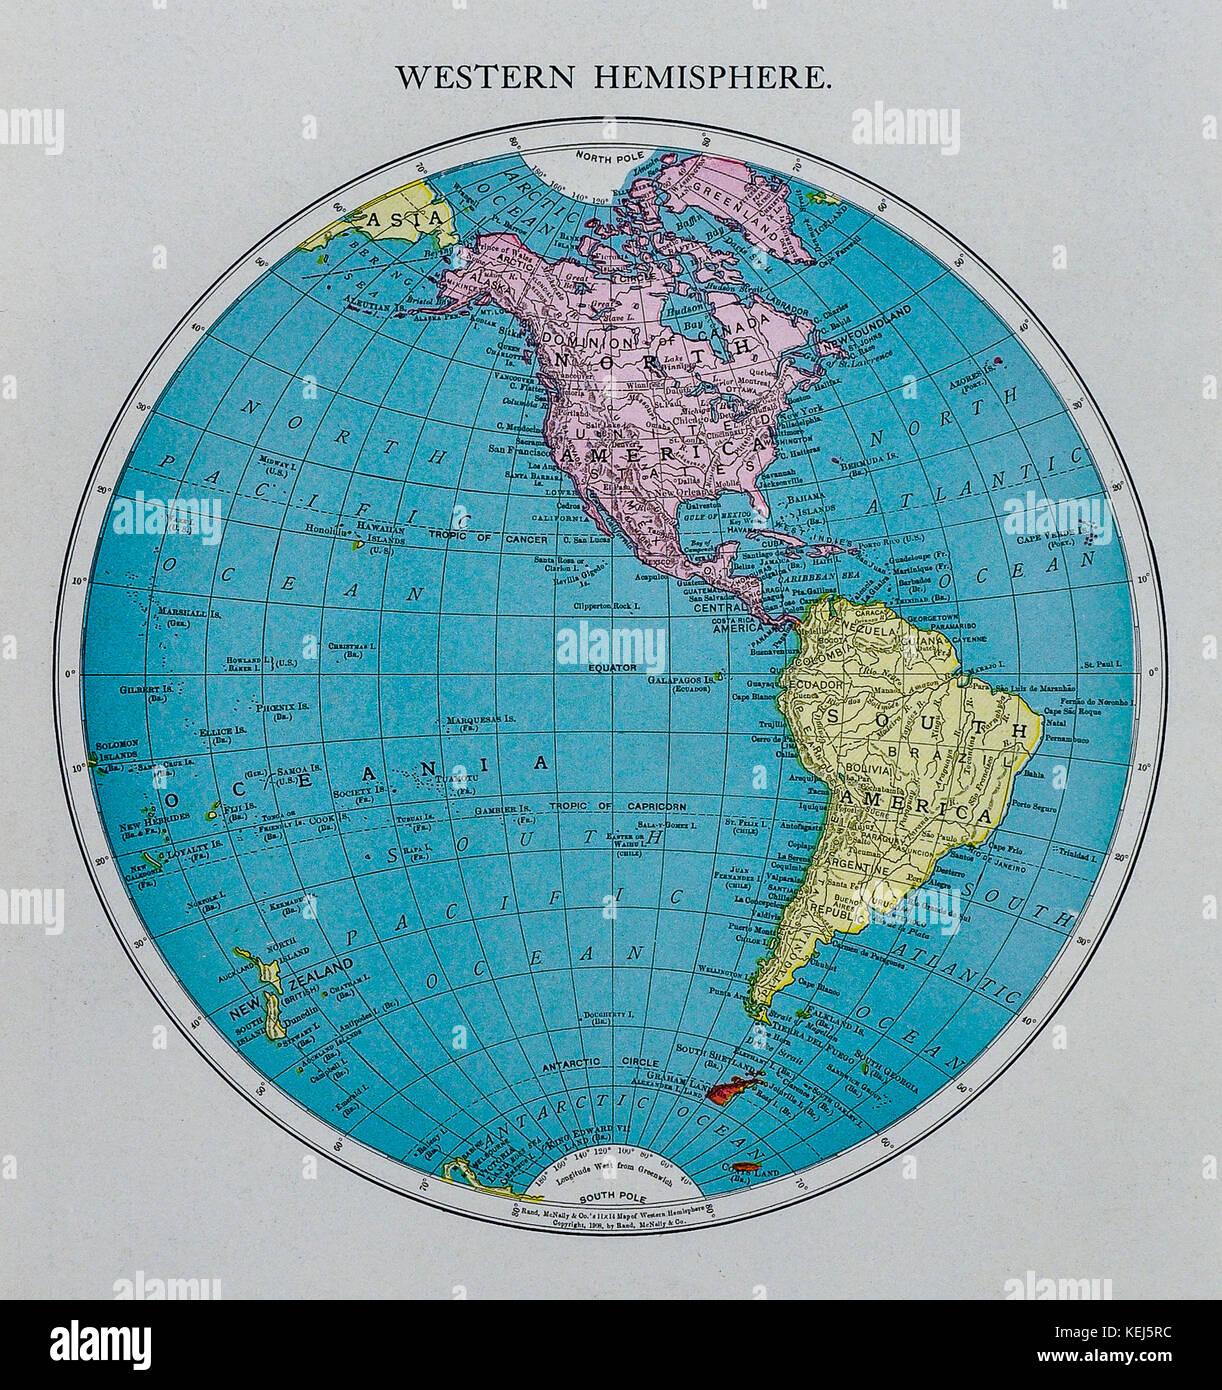 Mcnally Antique World Western Hemisphere Map Showing